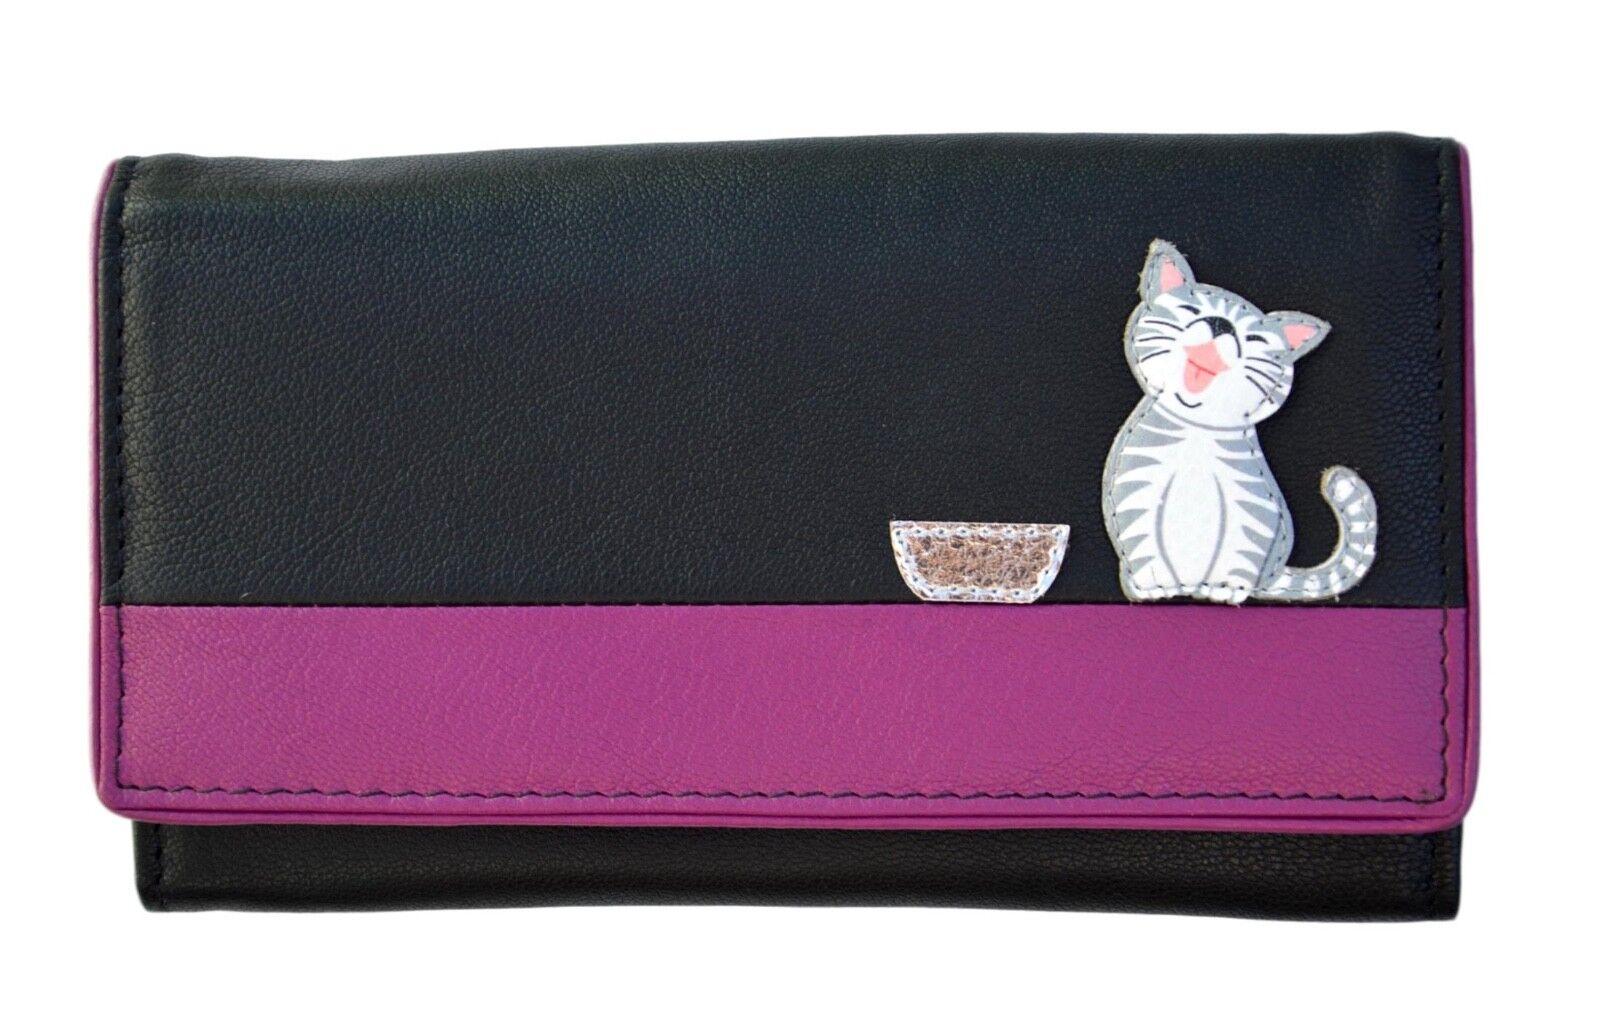 MALA Leather Cat Purse Black Ladies Bi-Fold Coin Card Holder Large Wallet Purses